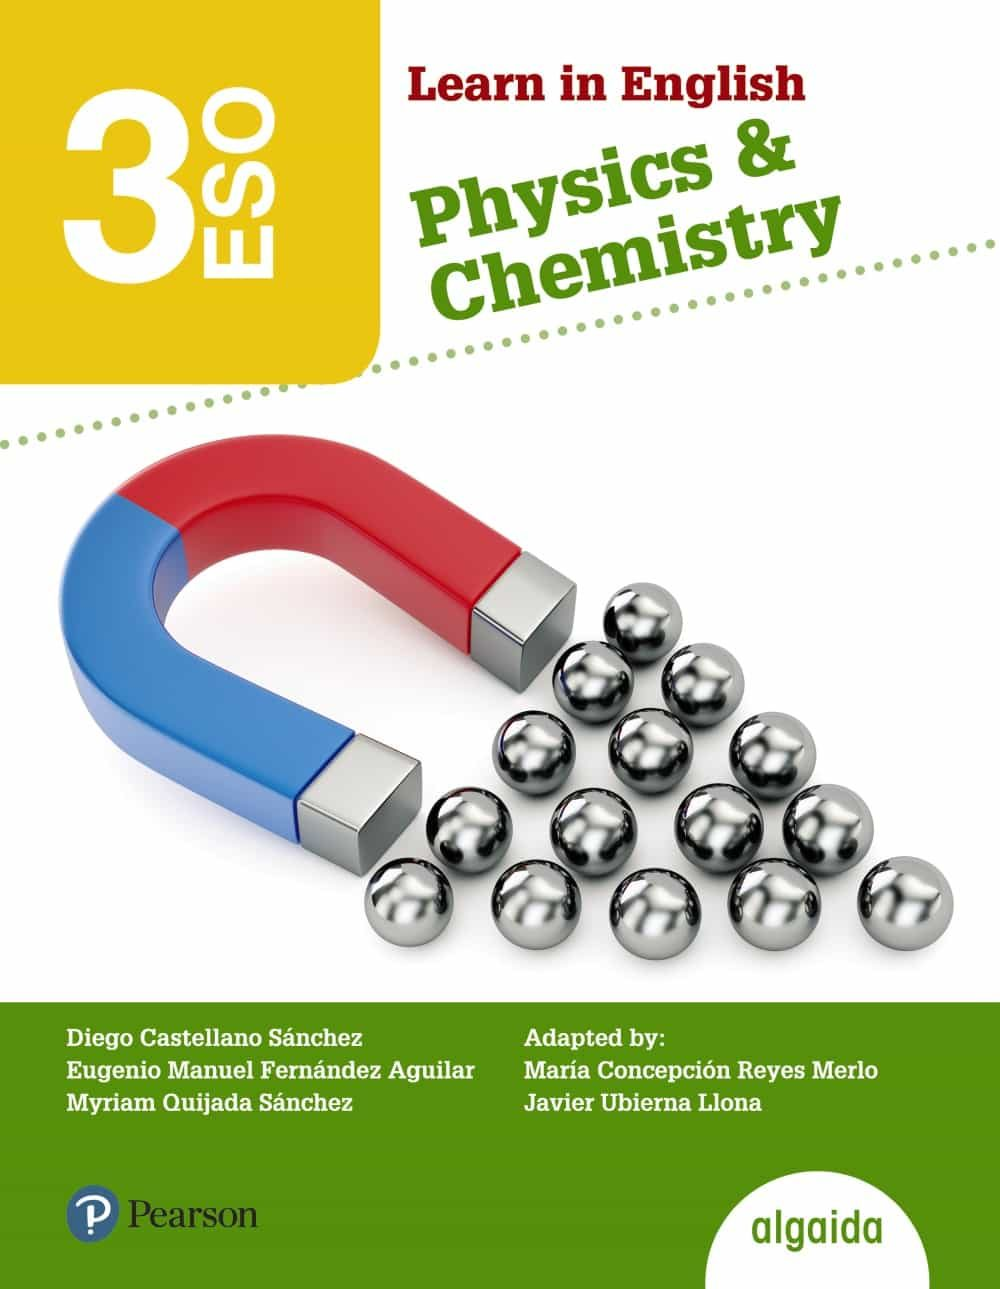 descargar LEARN IN ENGLISH PHYSICS & CHEMISTRY 3º ESO SEGUNDO CICLO ANDALUC IA / CEUTA / MELILLA pdf, ebook